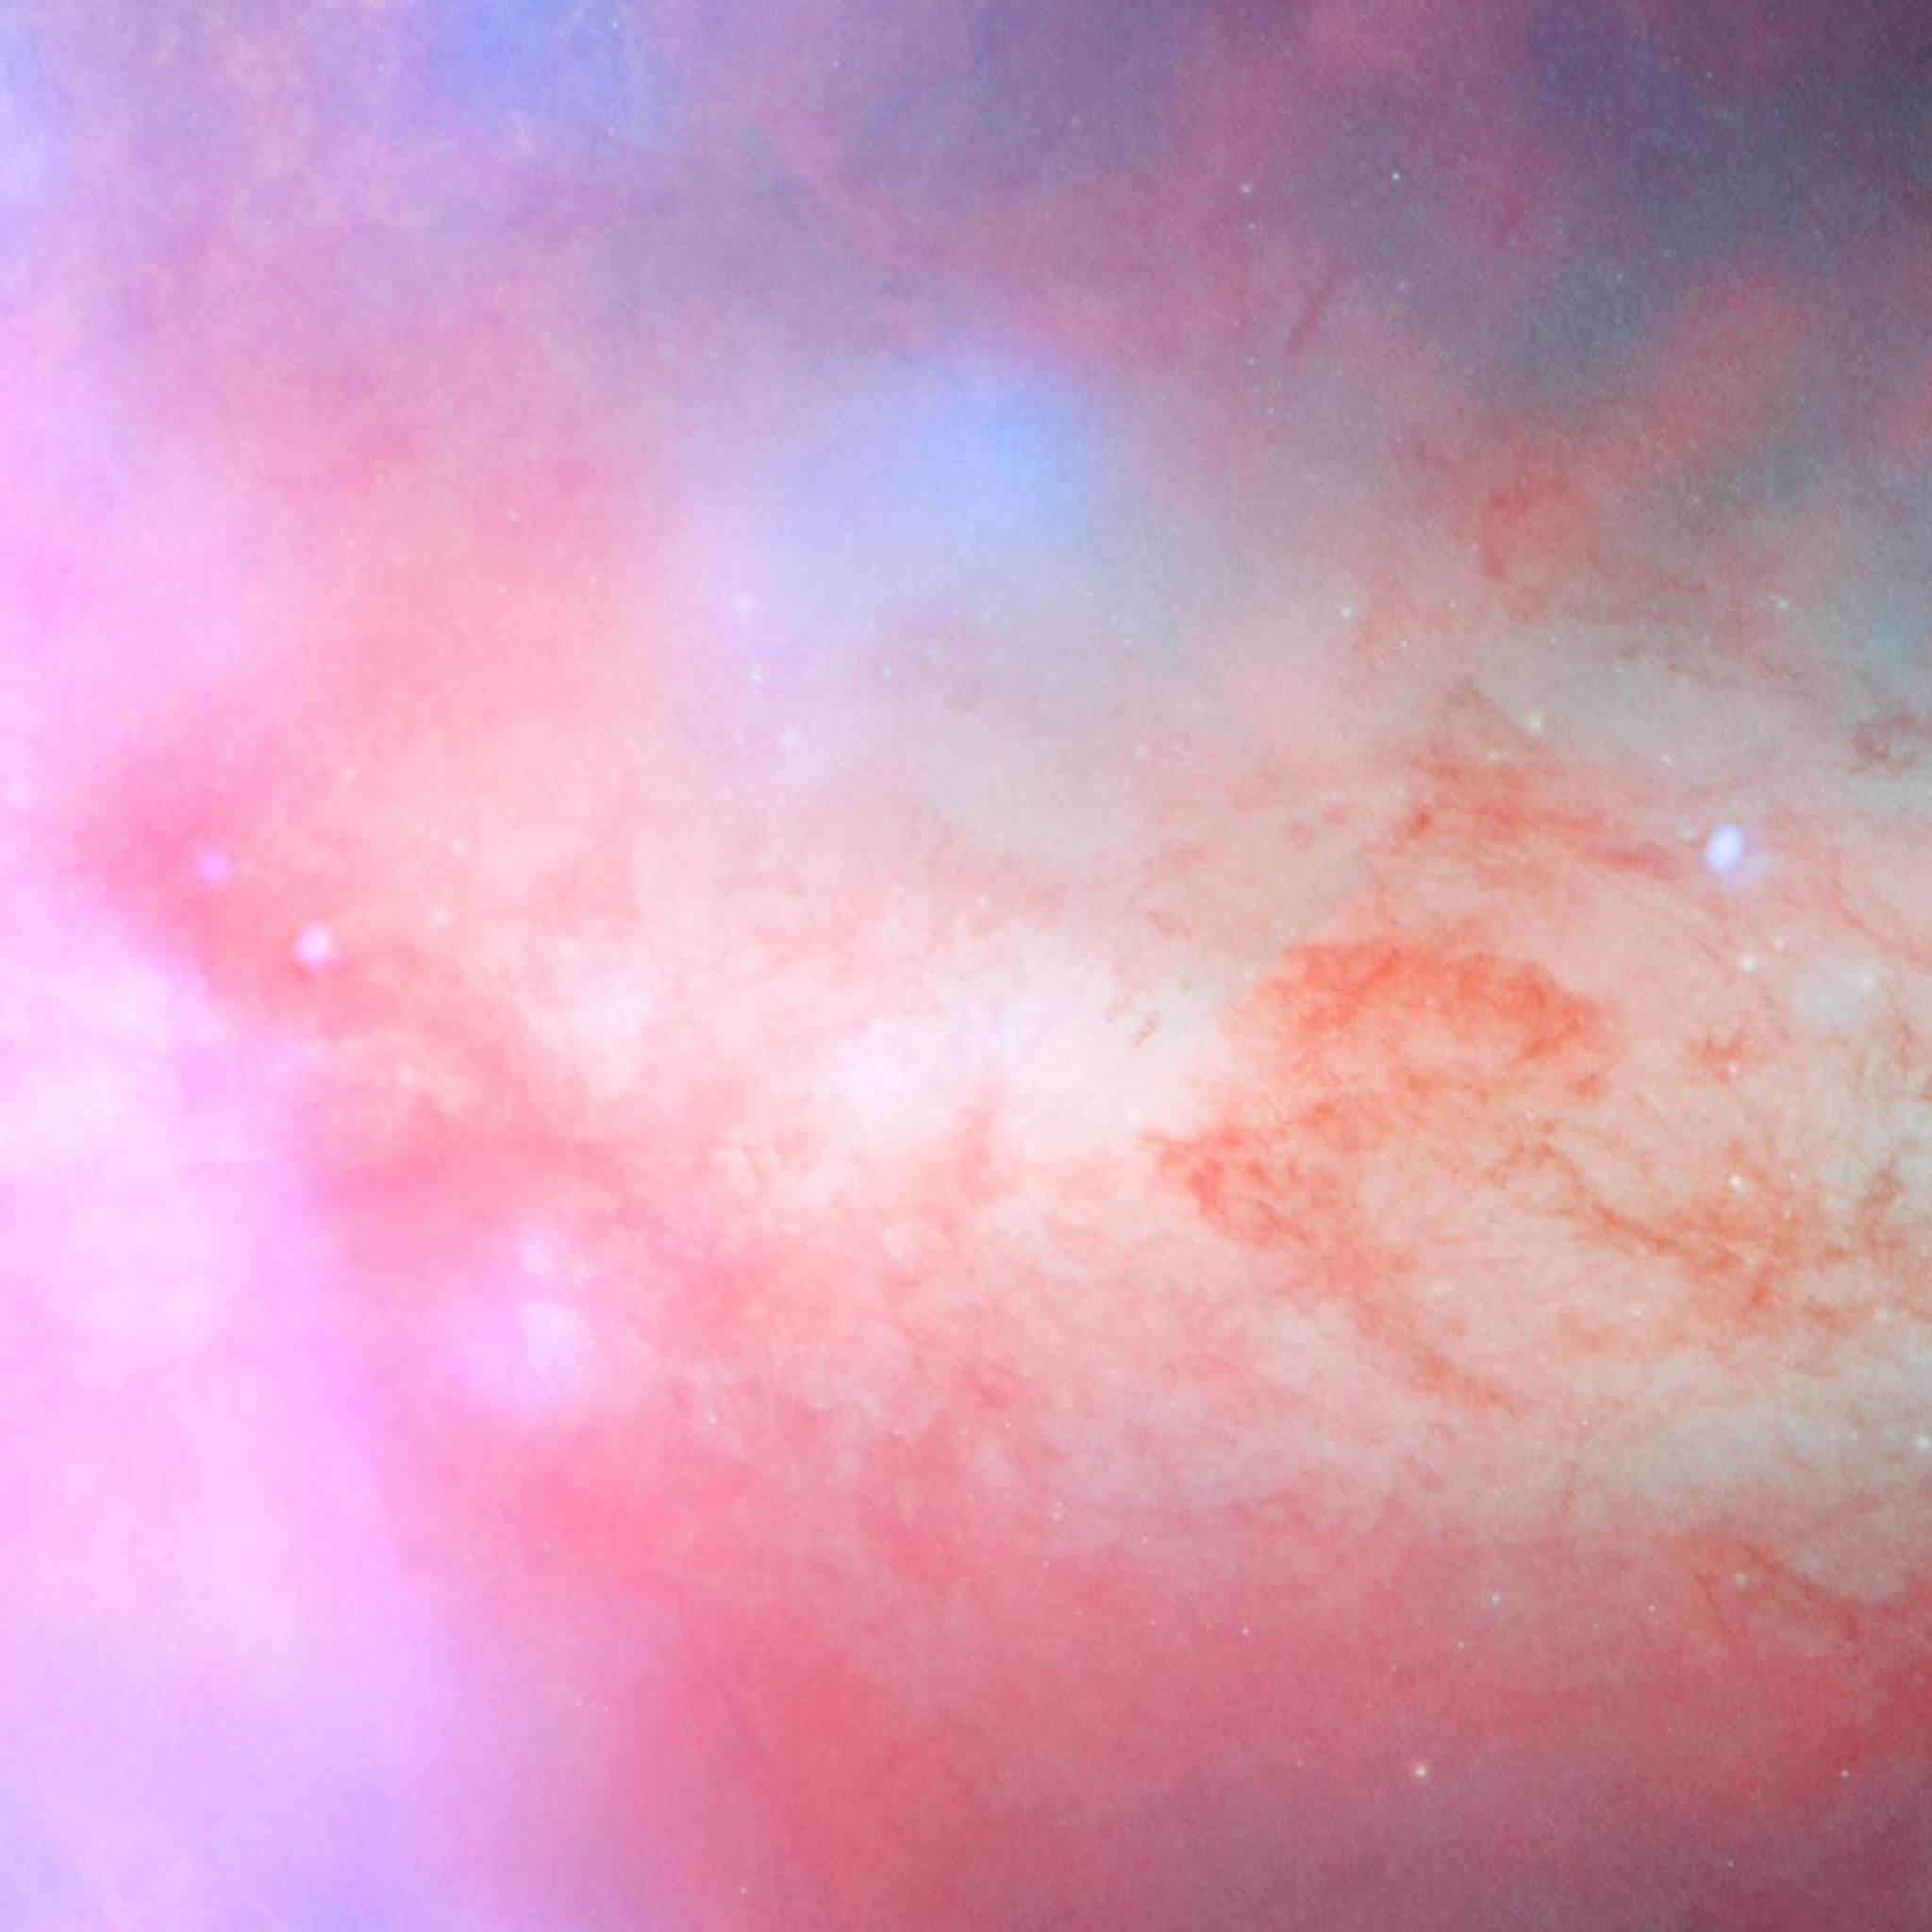 blush pink nebula ipad air wallpaper download | iphone wallpapers